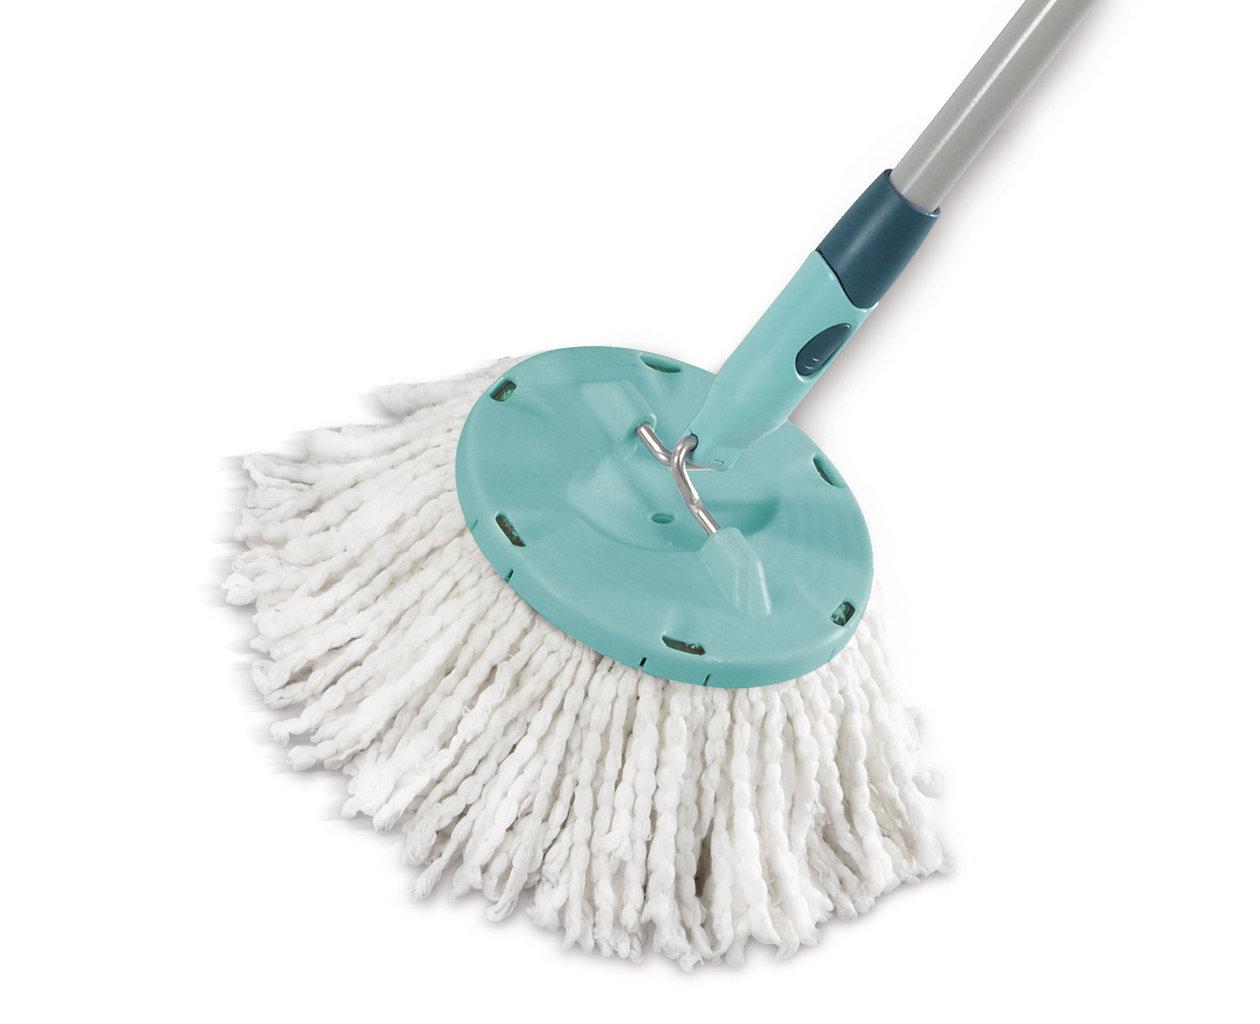 ricambio mocio clean twist mop leifheit compra online rosi store. Black Bedroom Furniture Sets. Home Design Ideas